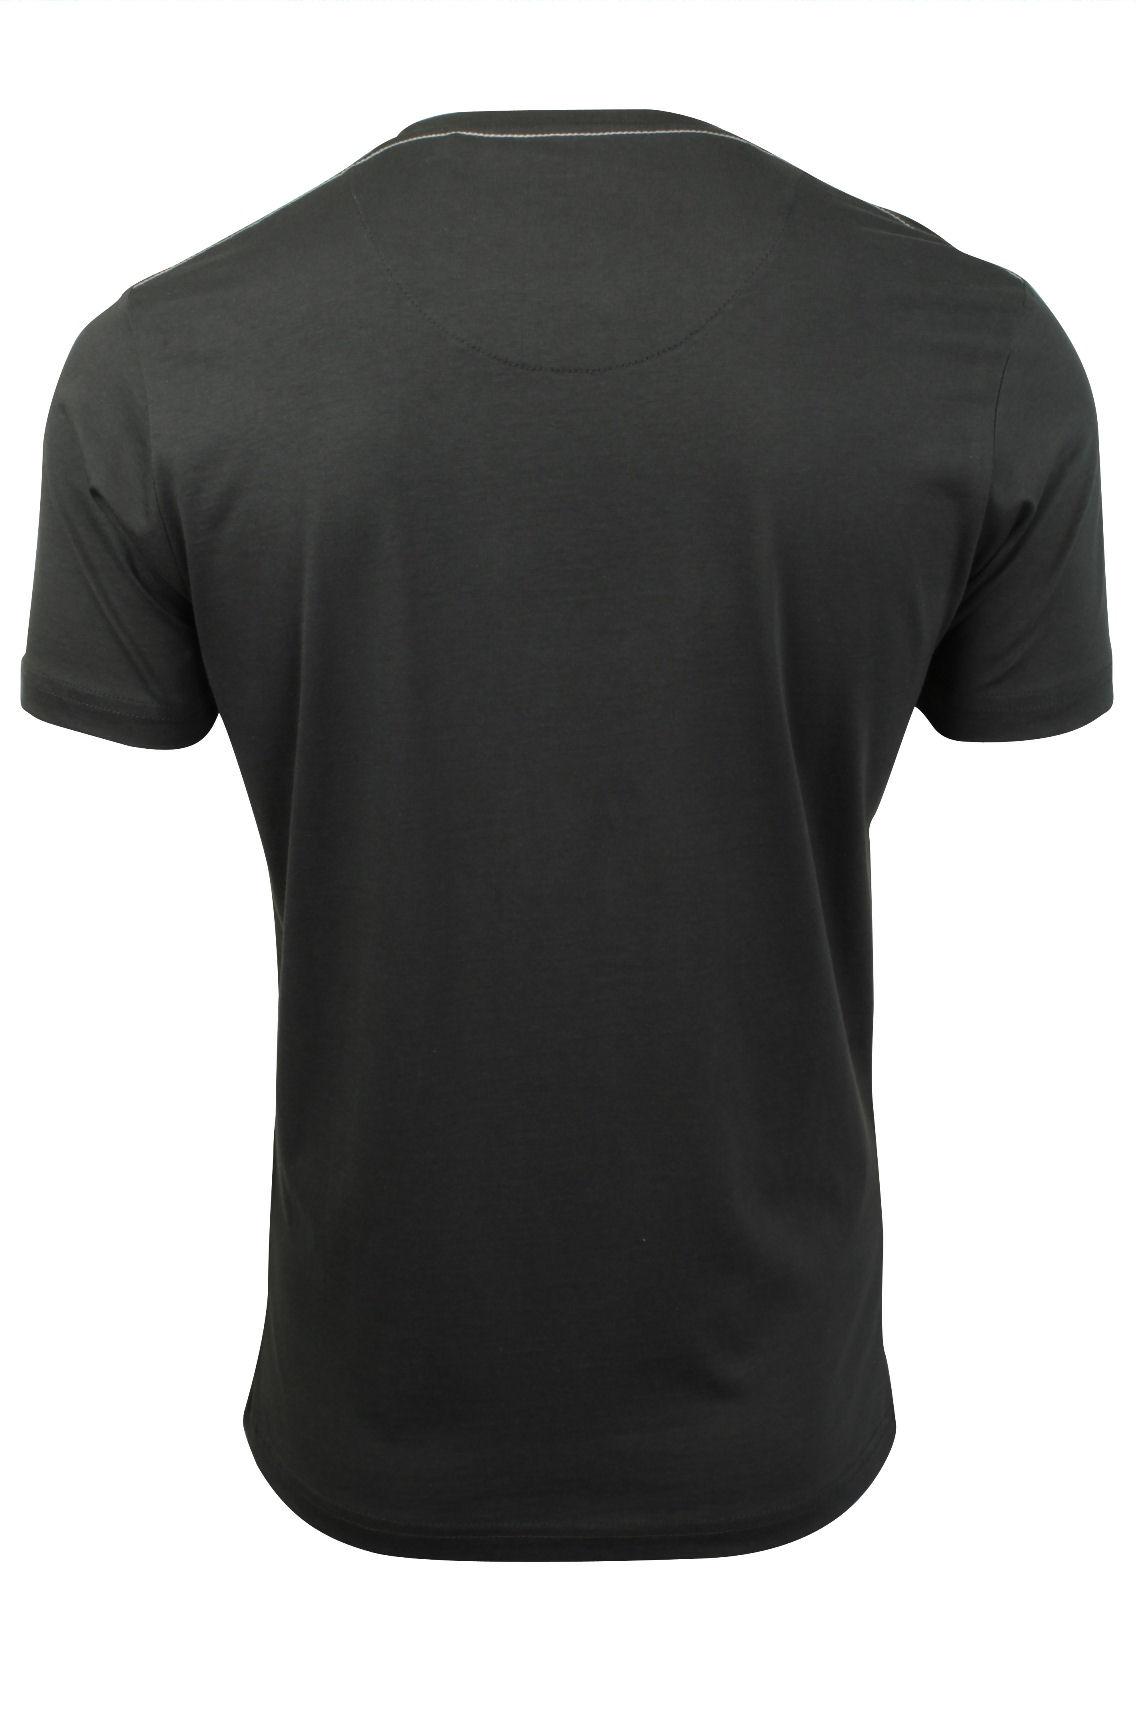 Firetrap-Hombre-Camiseta-de-manga-corta-039-Towson-039 miniatura 9